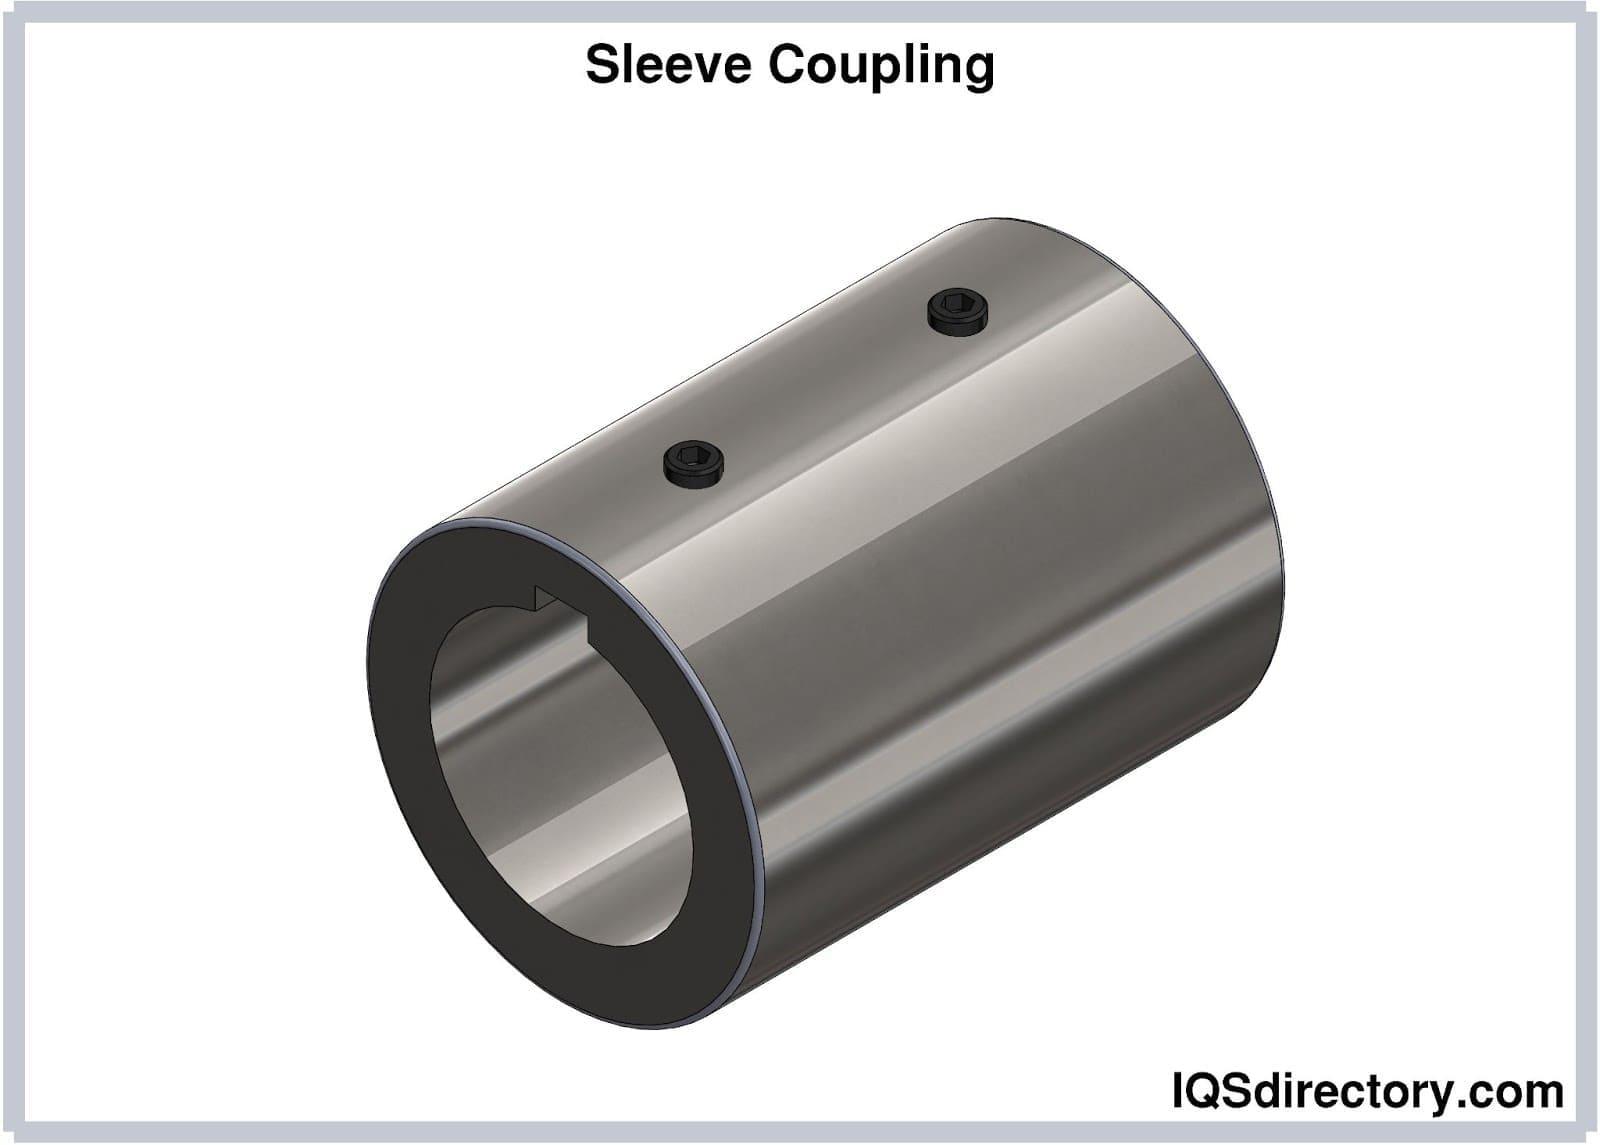 Sleeve Coupling